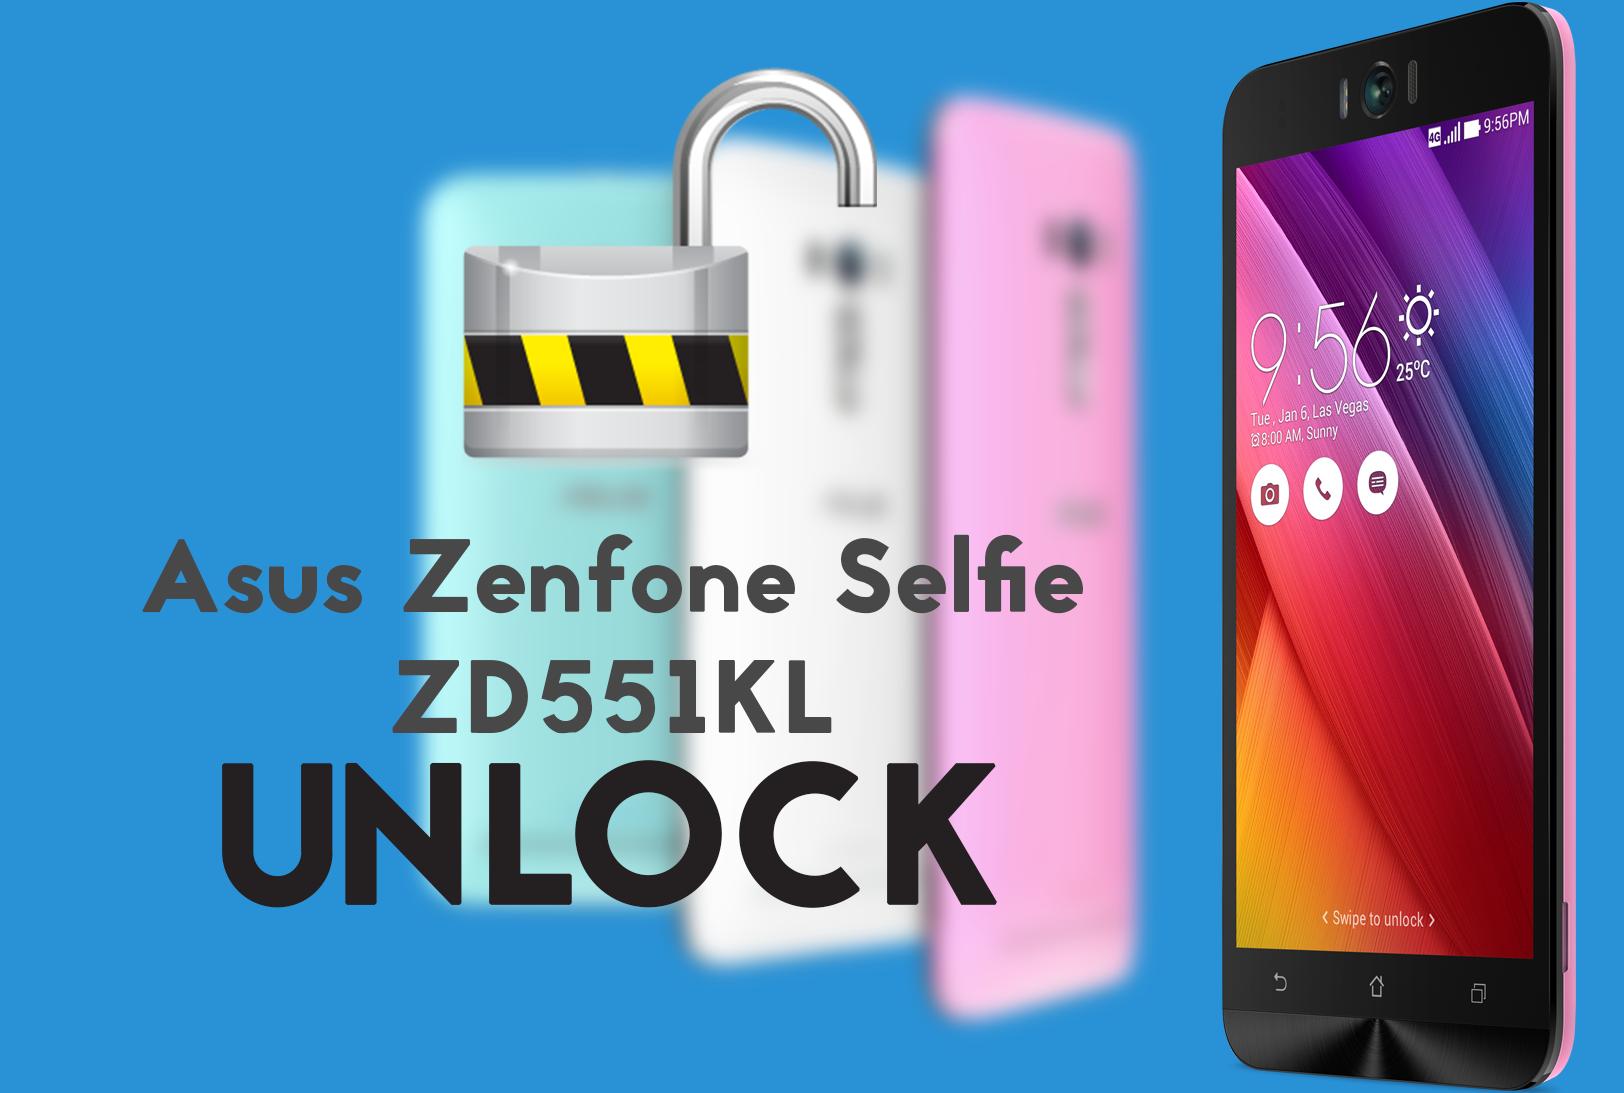 Asus Zenfone Selfie ZD551KL Bootloader Kilidini Kırma zenfone selfie bootloader zd551kl bootloader unlock bootloader kilidi kırma bootloader apk asus